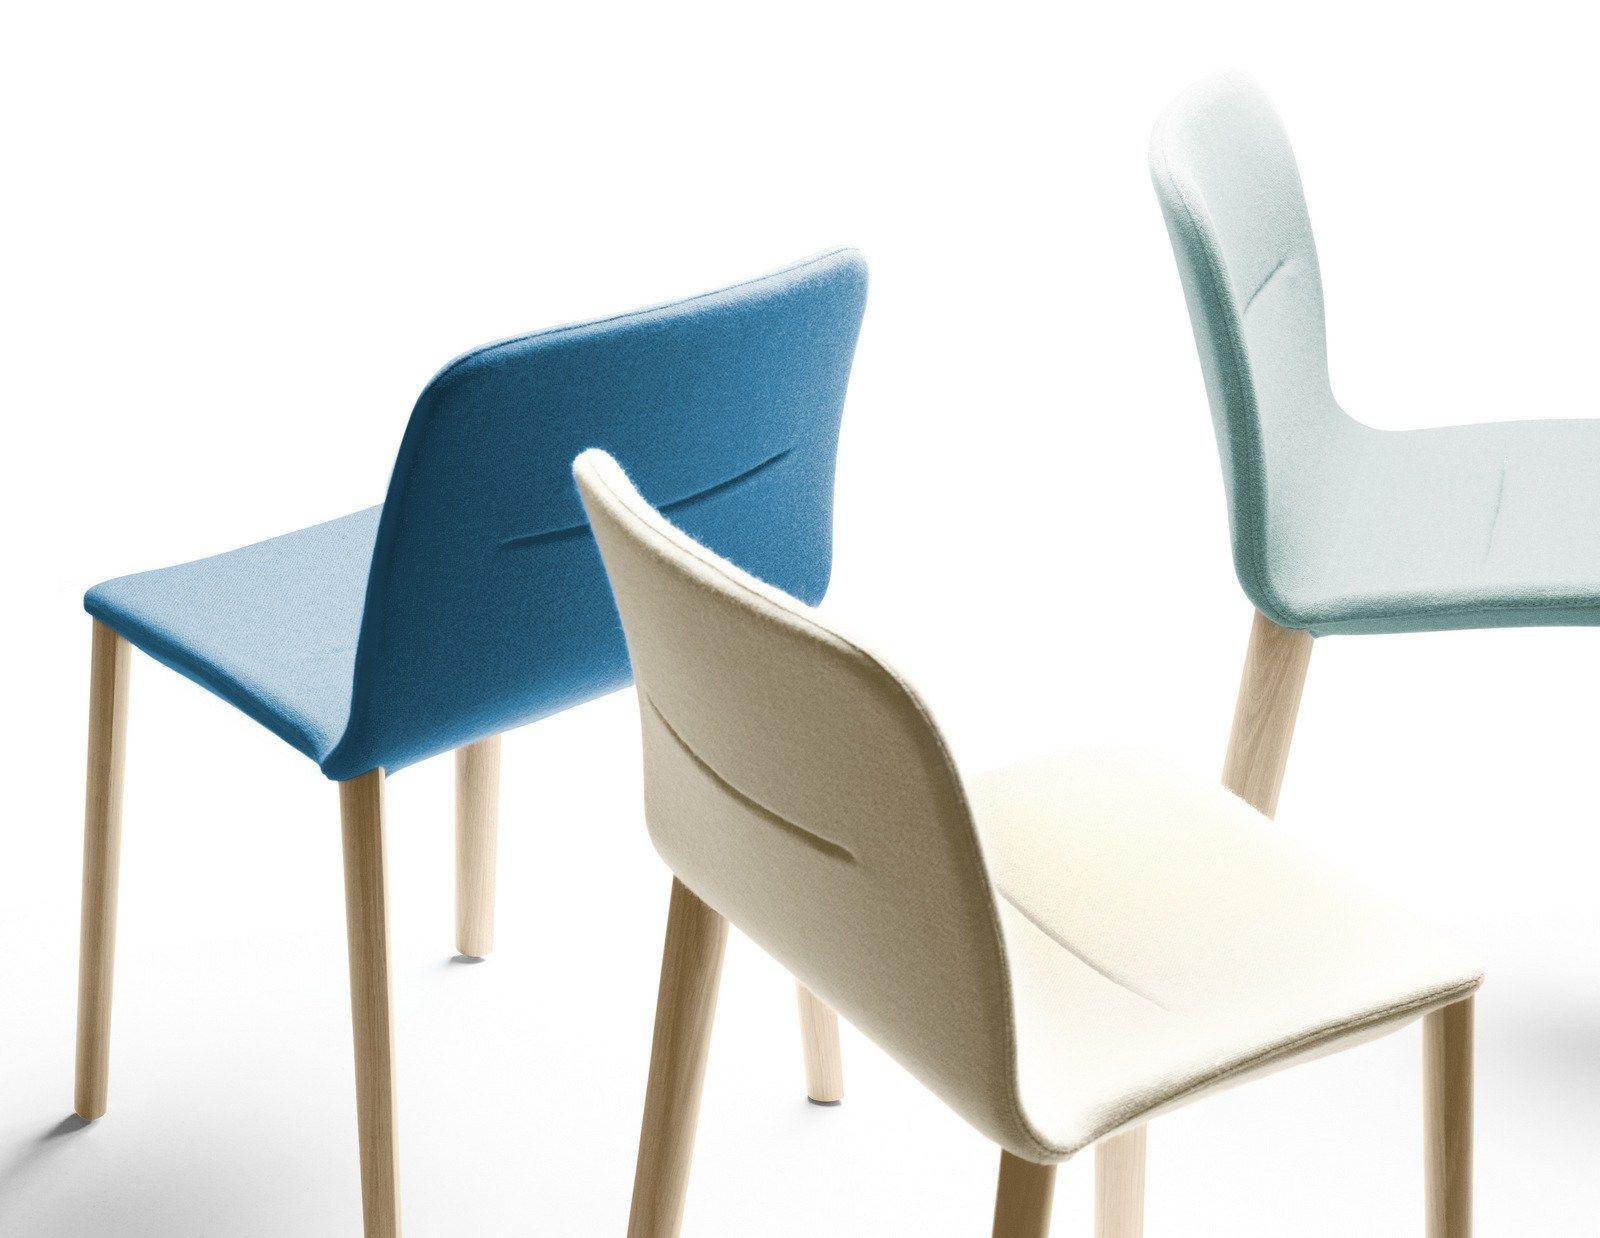 jantzi chaise en tissu by alki design samuel accoceberry. Black Bedroom Furniture Sets. Home Design Ideas